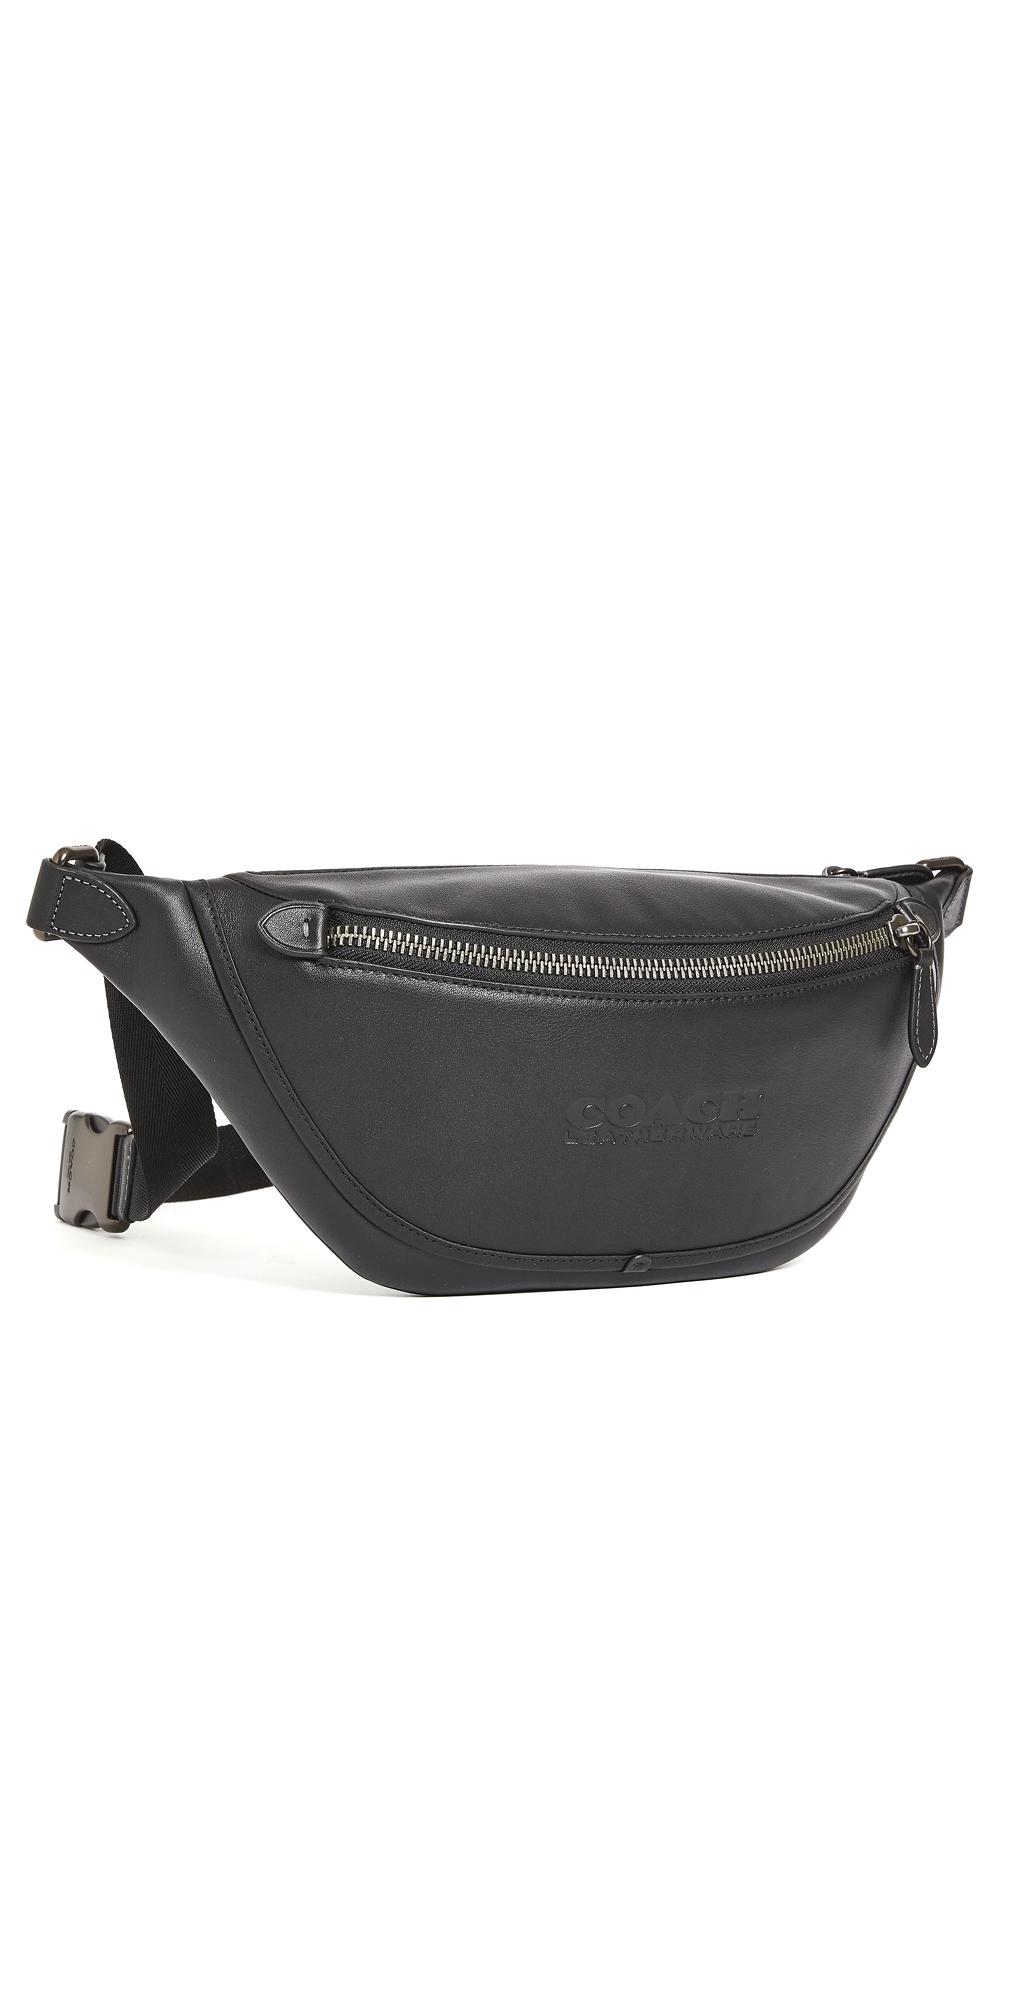 League Belt Bag